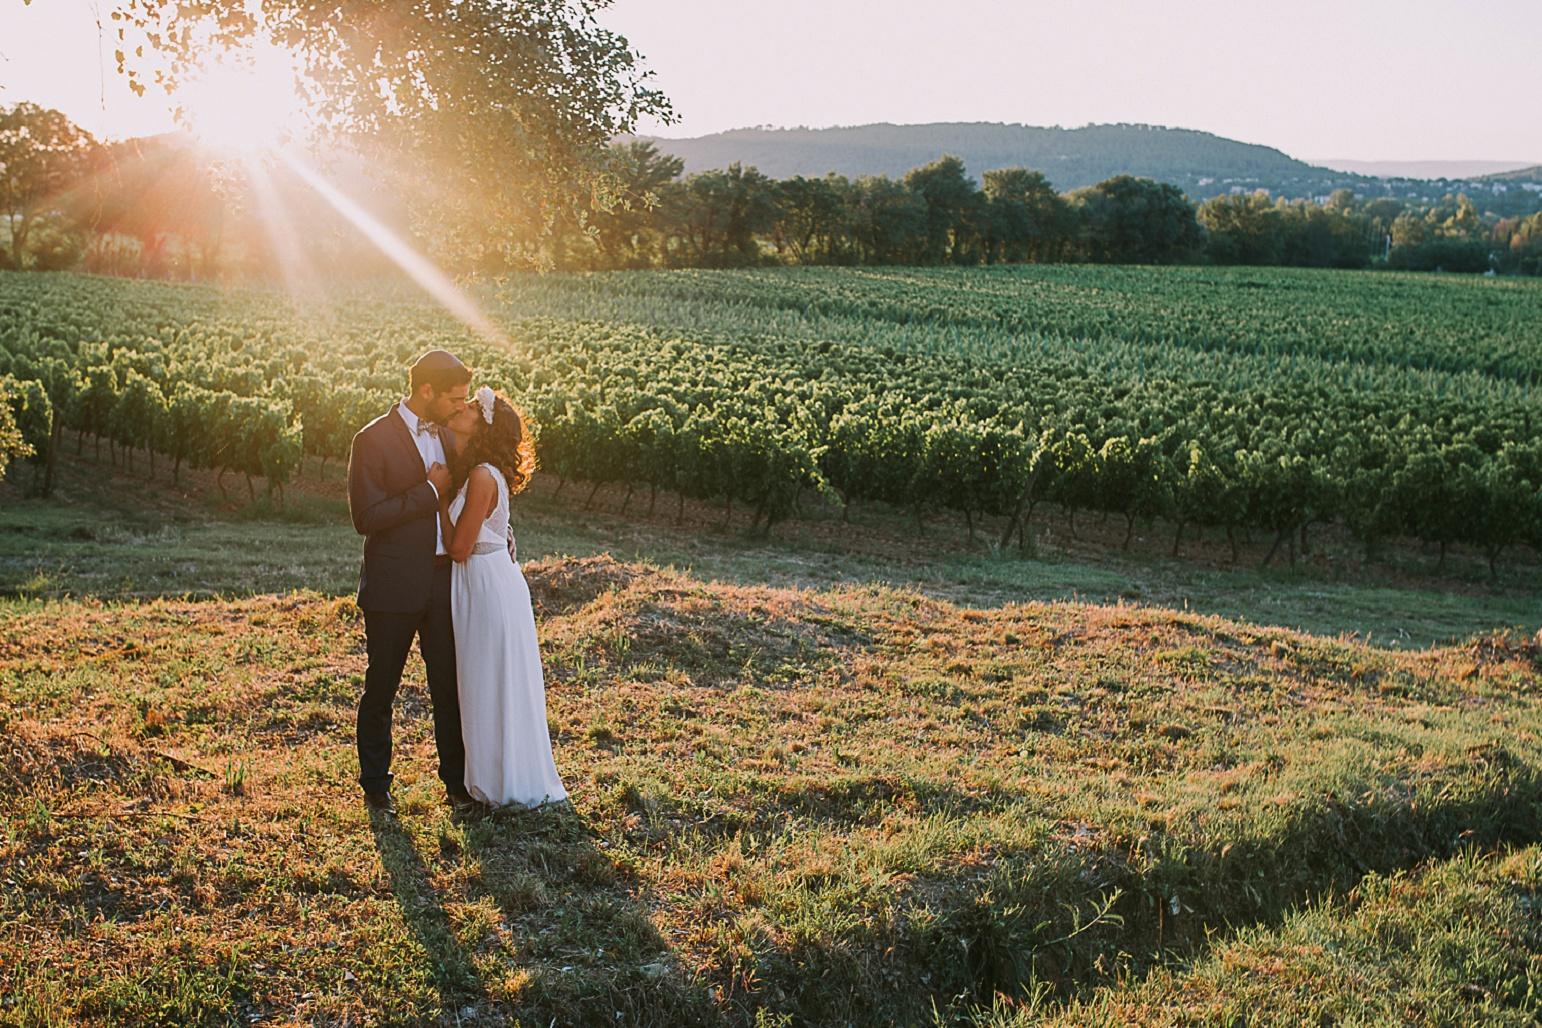 sun-glows-mariage-photographe-chateau-maime-aix-nice-provence-wedding-arcs-sur-argens_